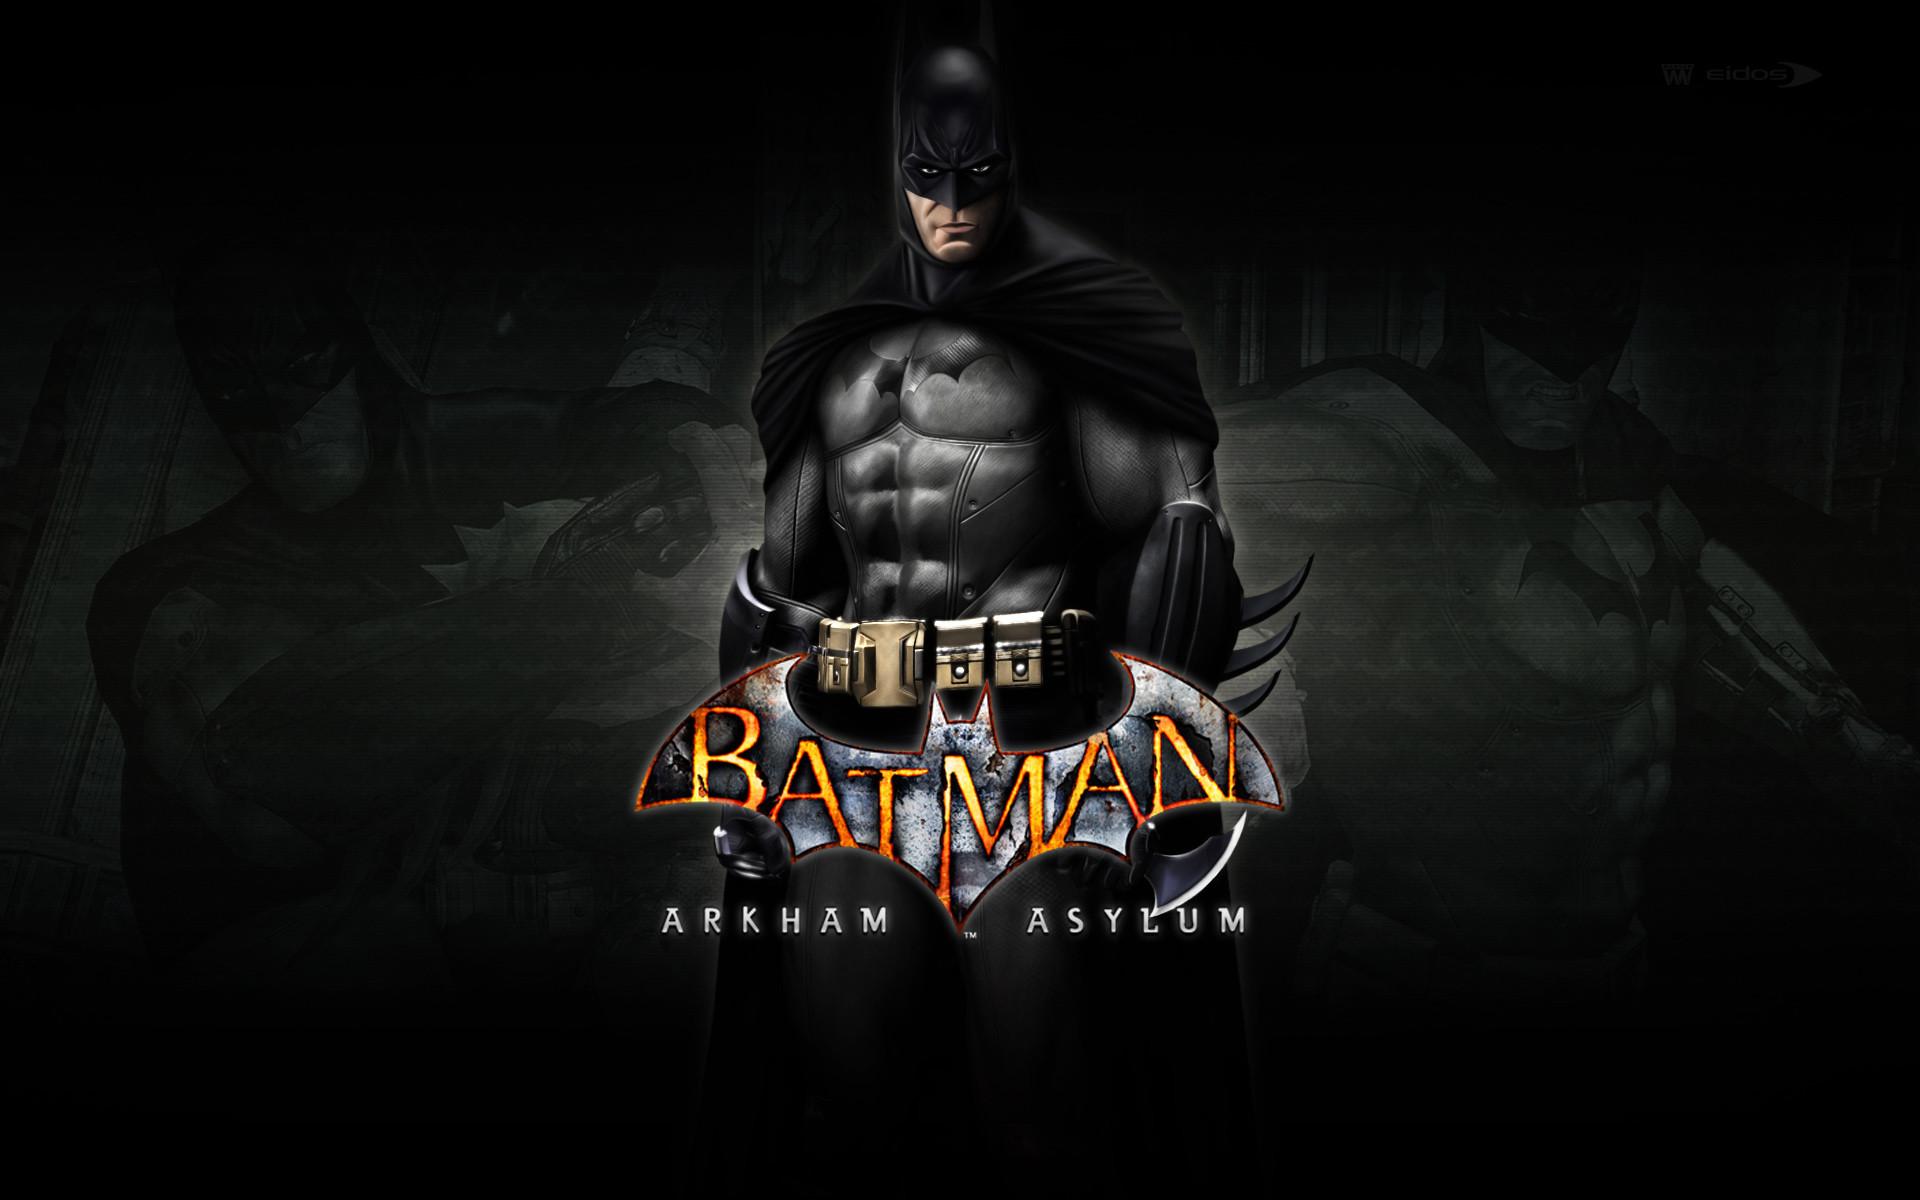 Batman Arkham Logo Wallpaper